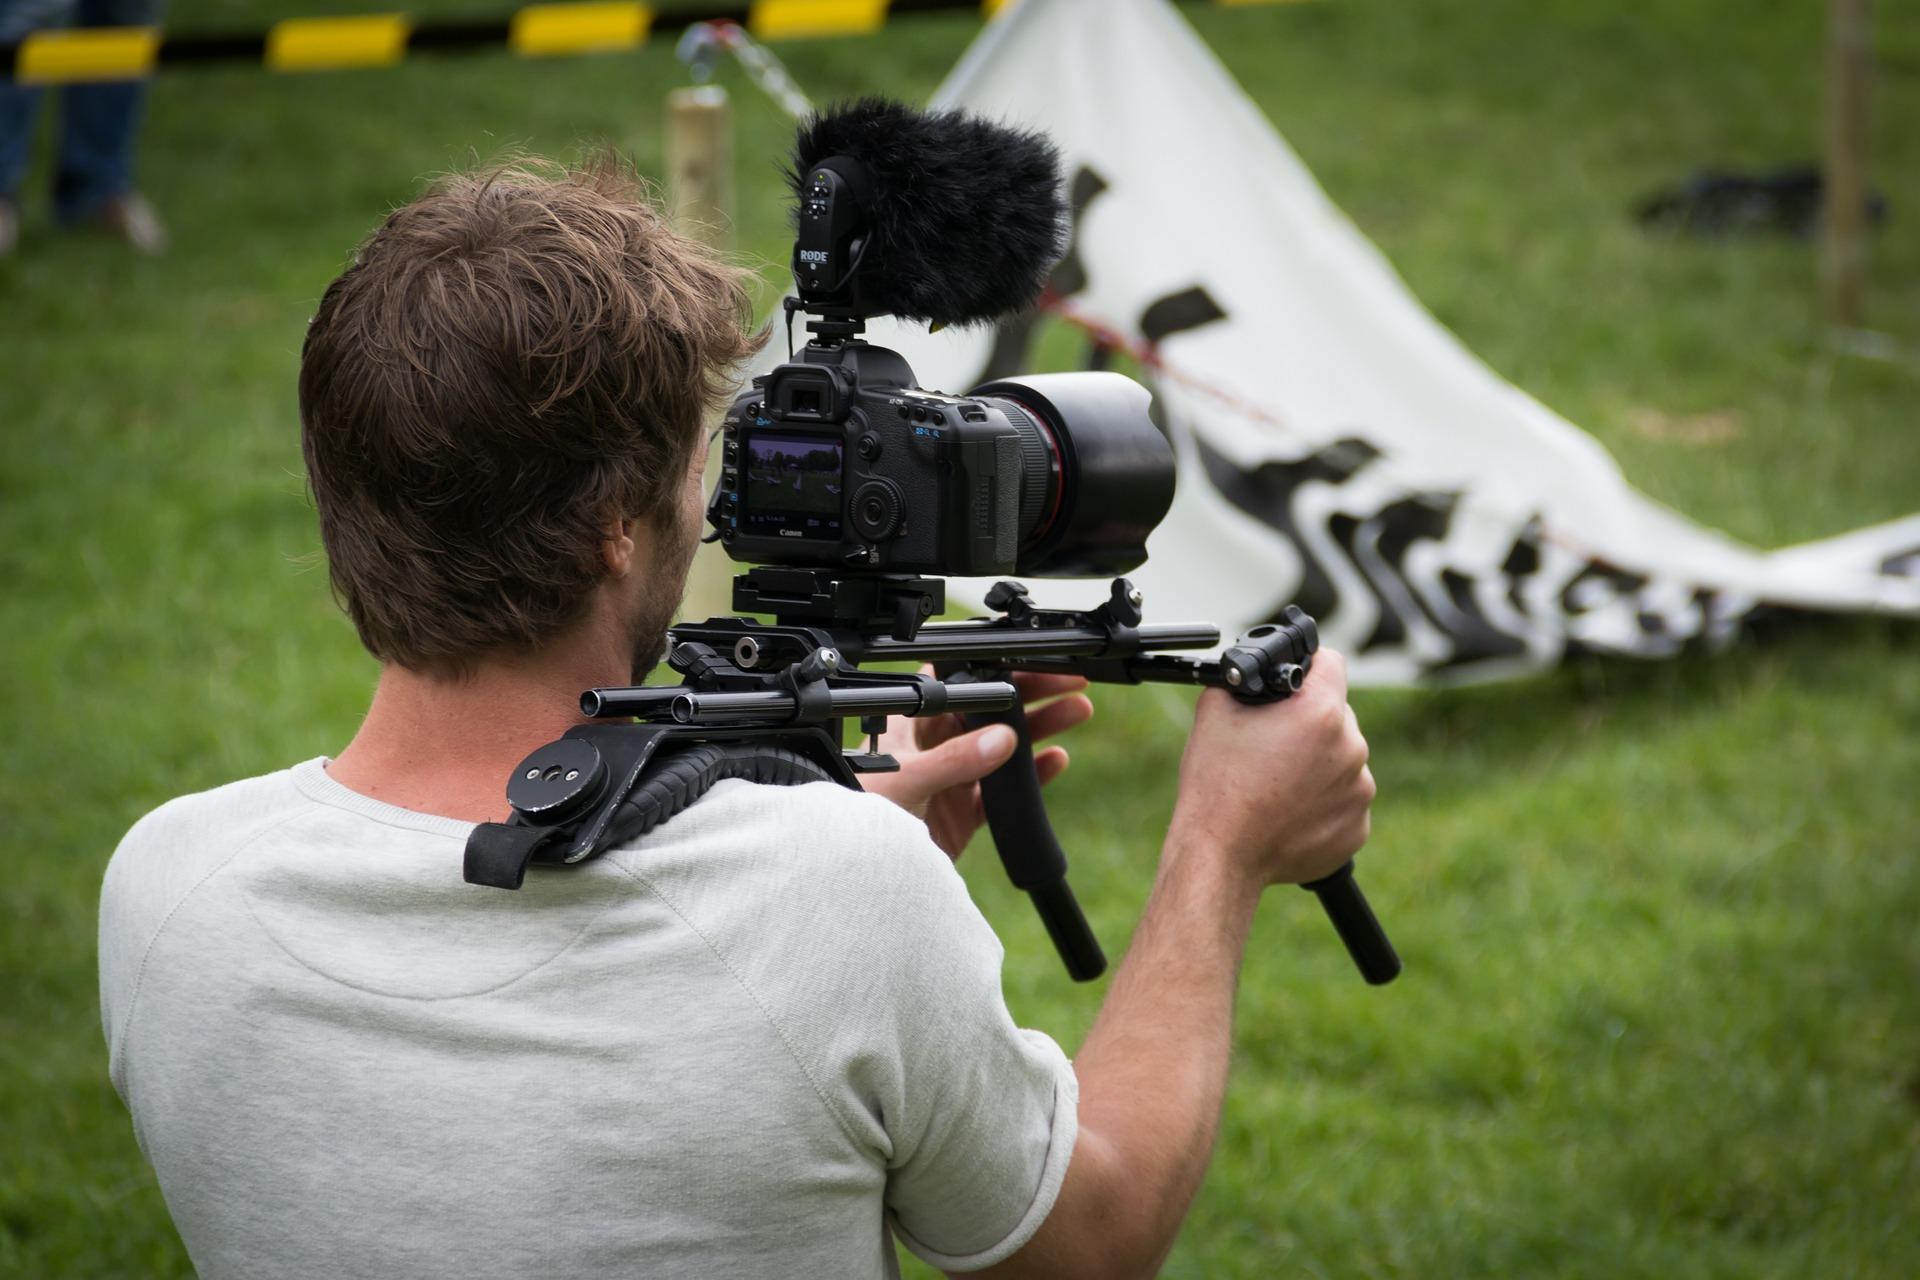 Image film - Filming